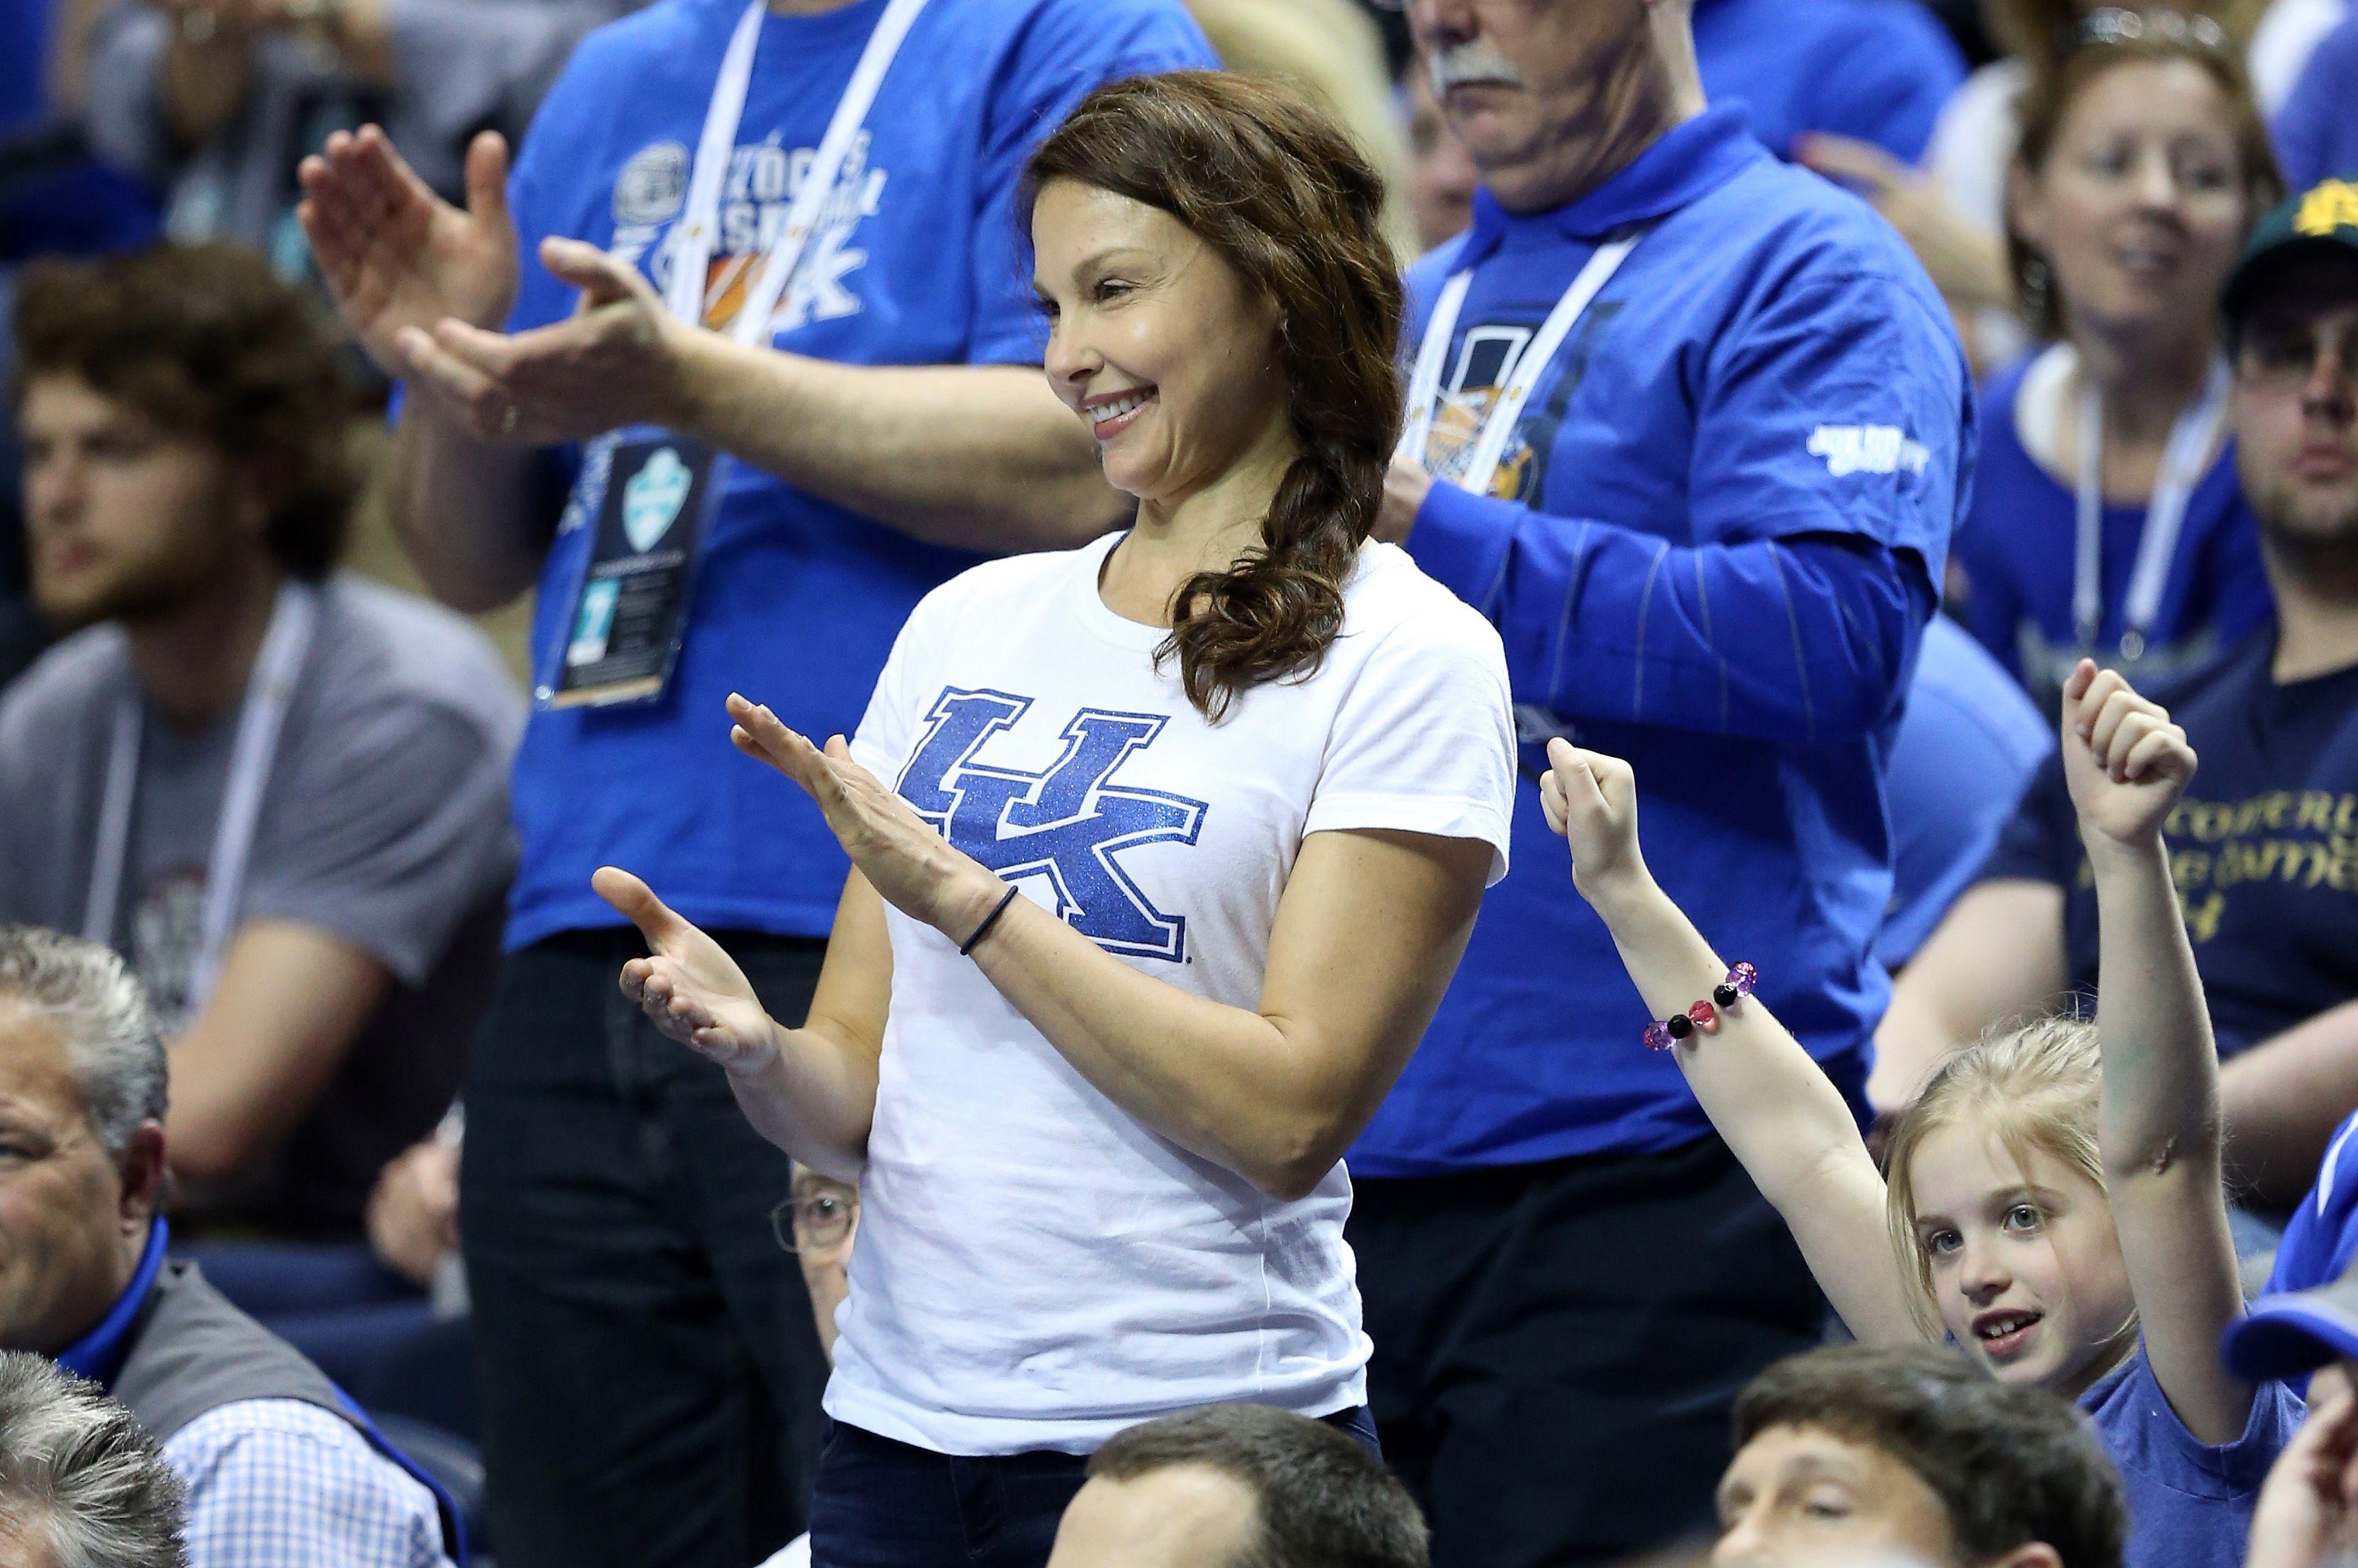 Ashley Judd Cunt ashley judd fights back against sexist twitter trolls in the